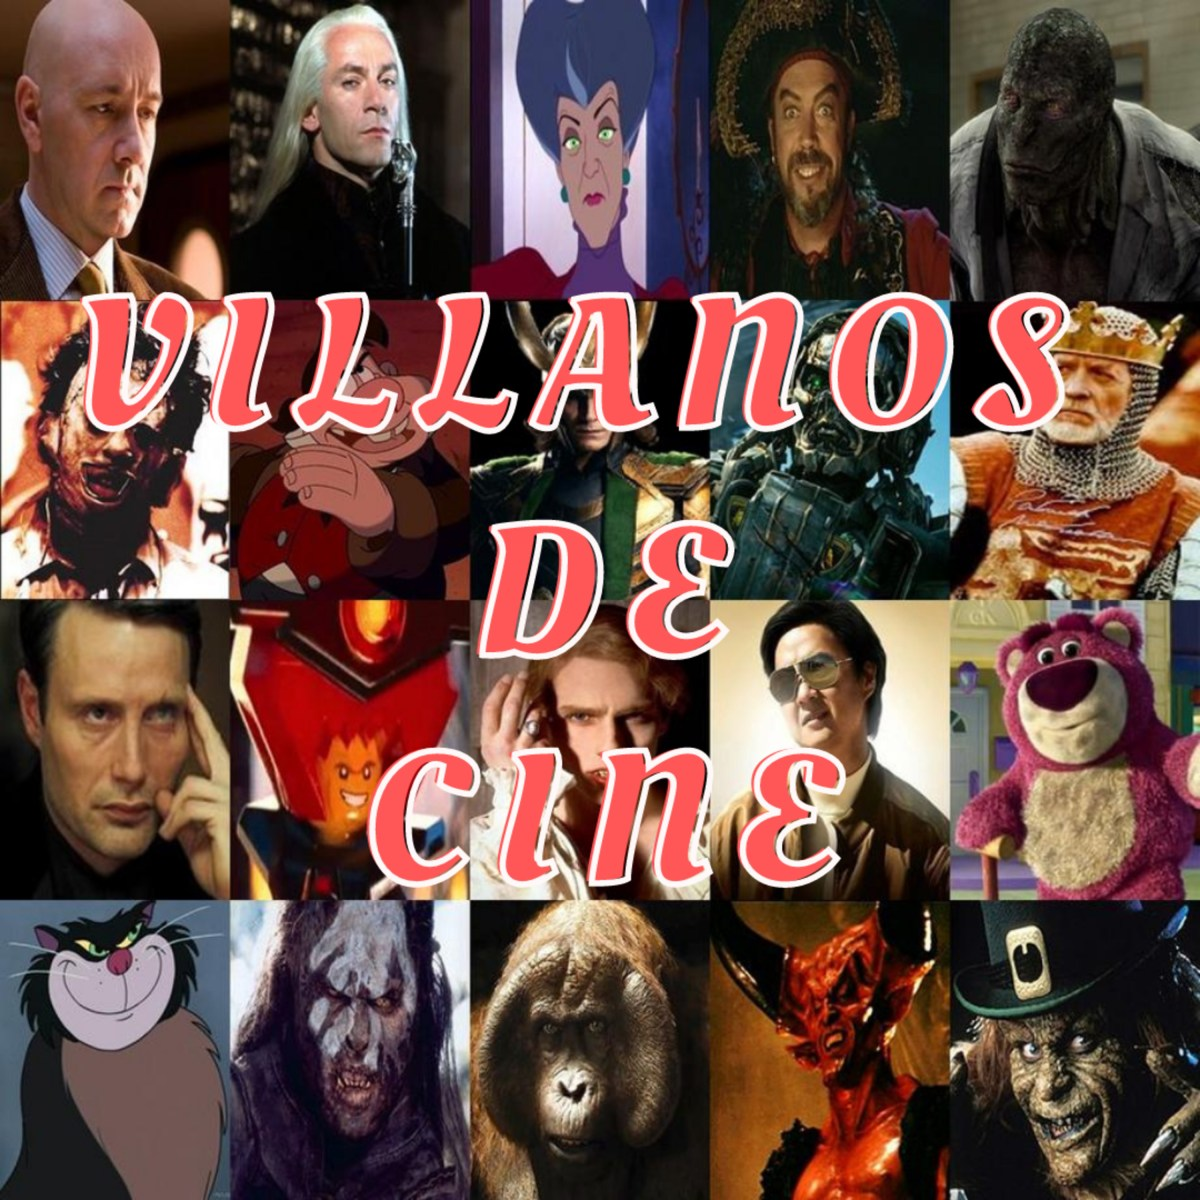 26. Villanos de cine